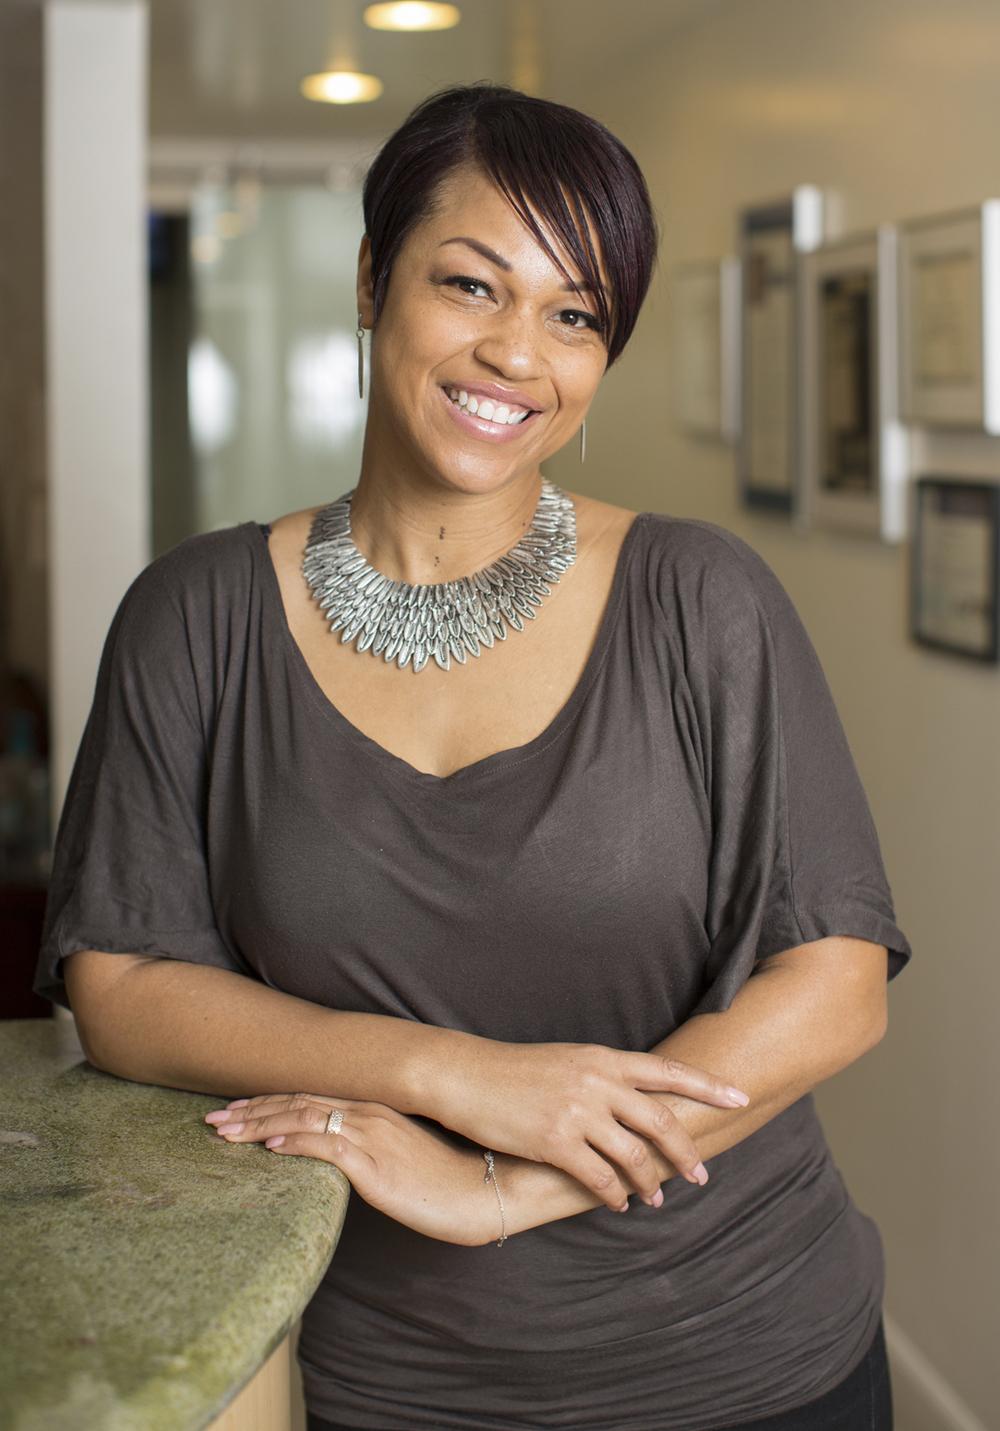 Tamara Synigal,Practice Administrator at Nice Teeth Dental in San Leandro, California.